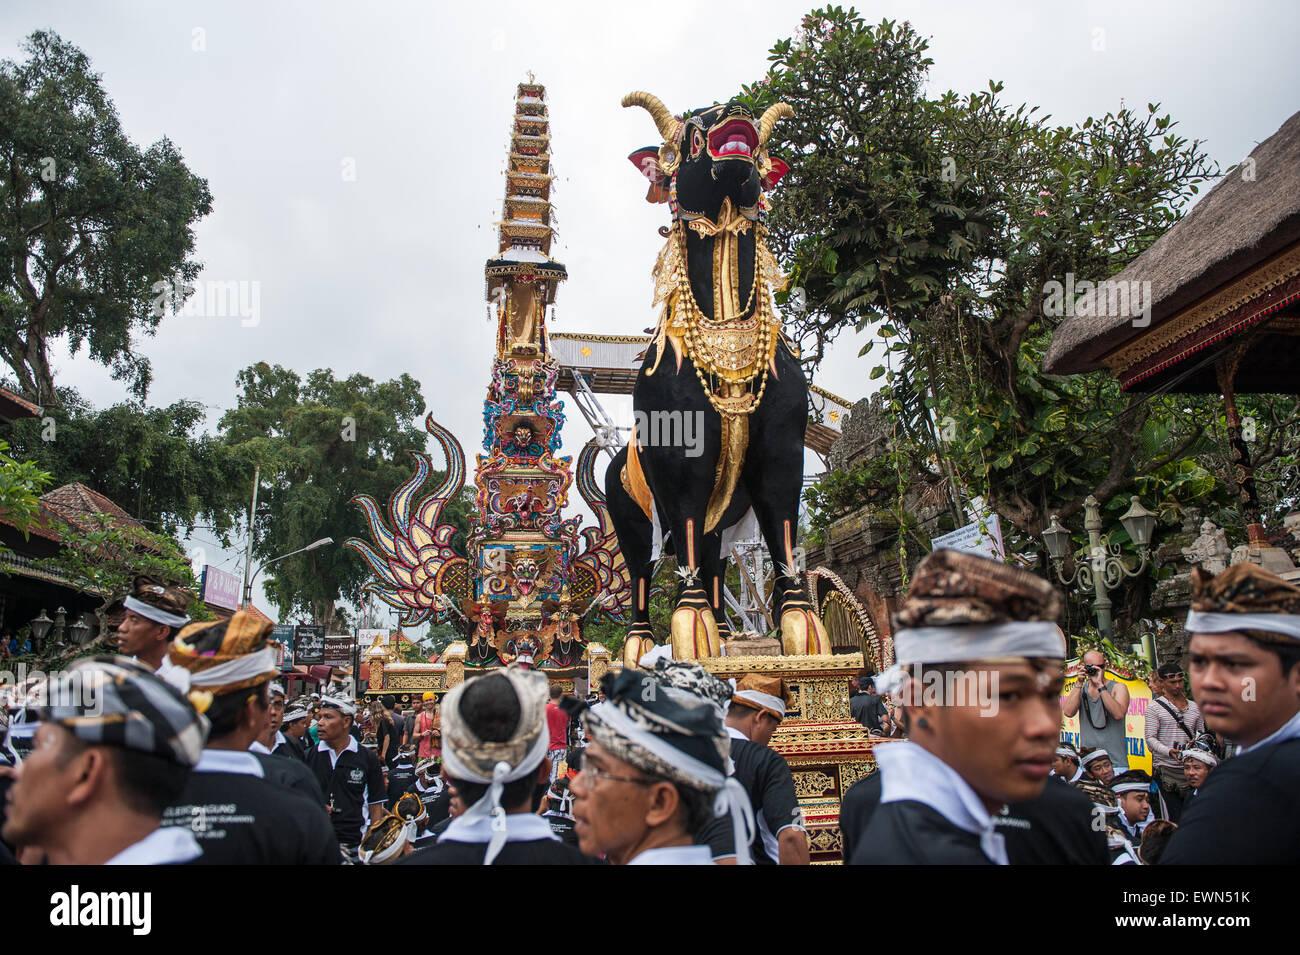 Funeral ceremony for Tjokorda Ngurah Wim Sukawati at Ubud, Bali, Indonesia, 14/05/2013. - Stock Image